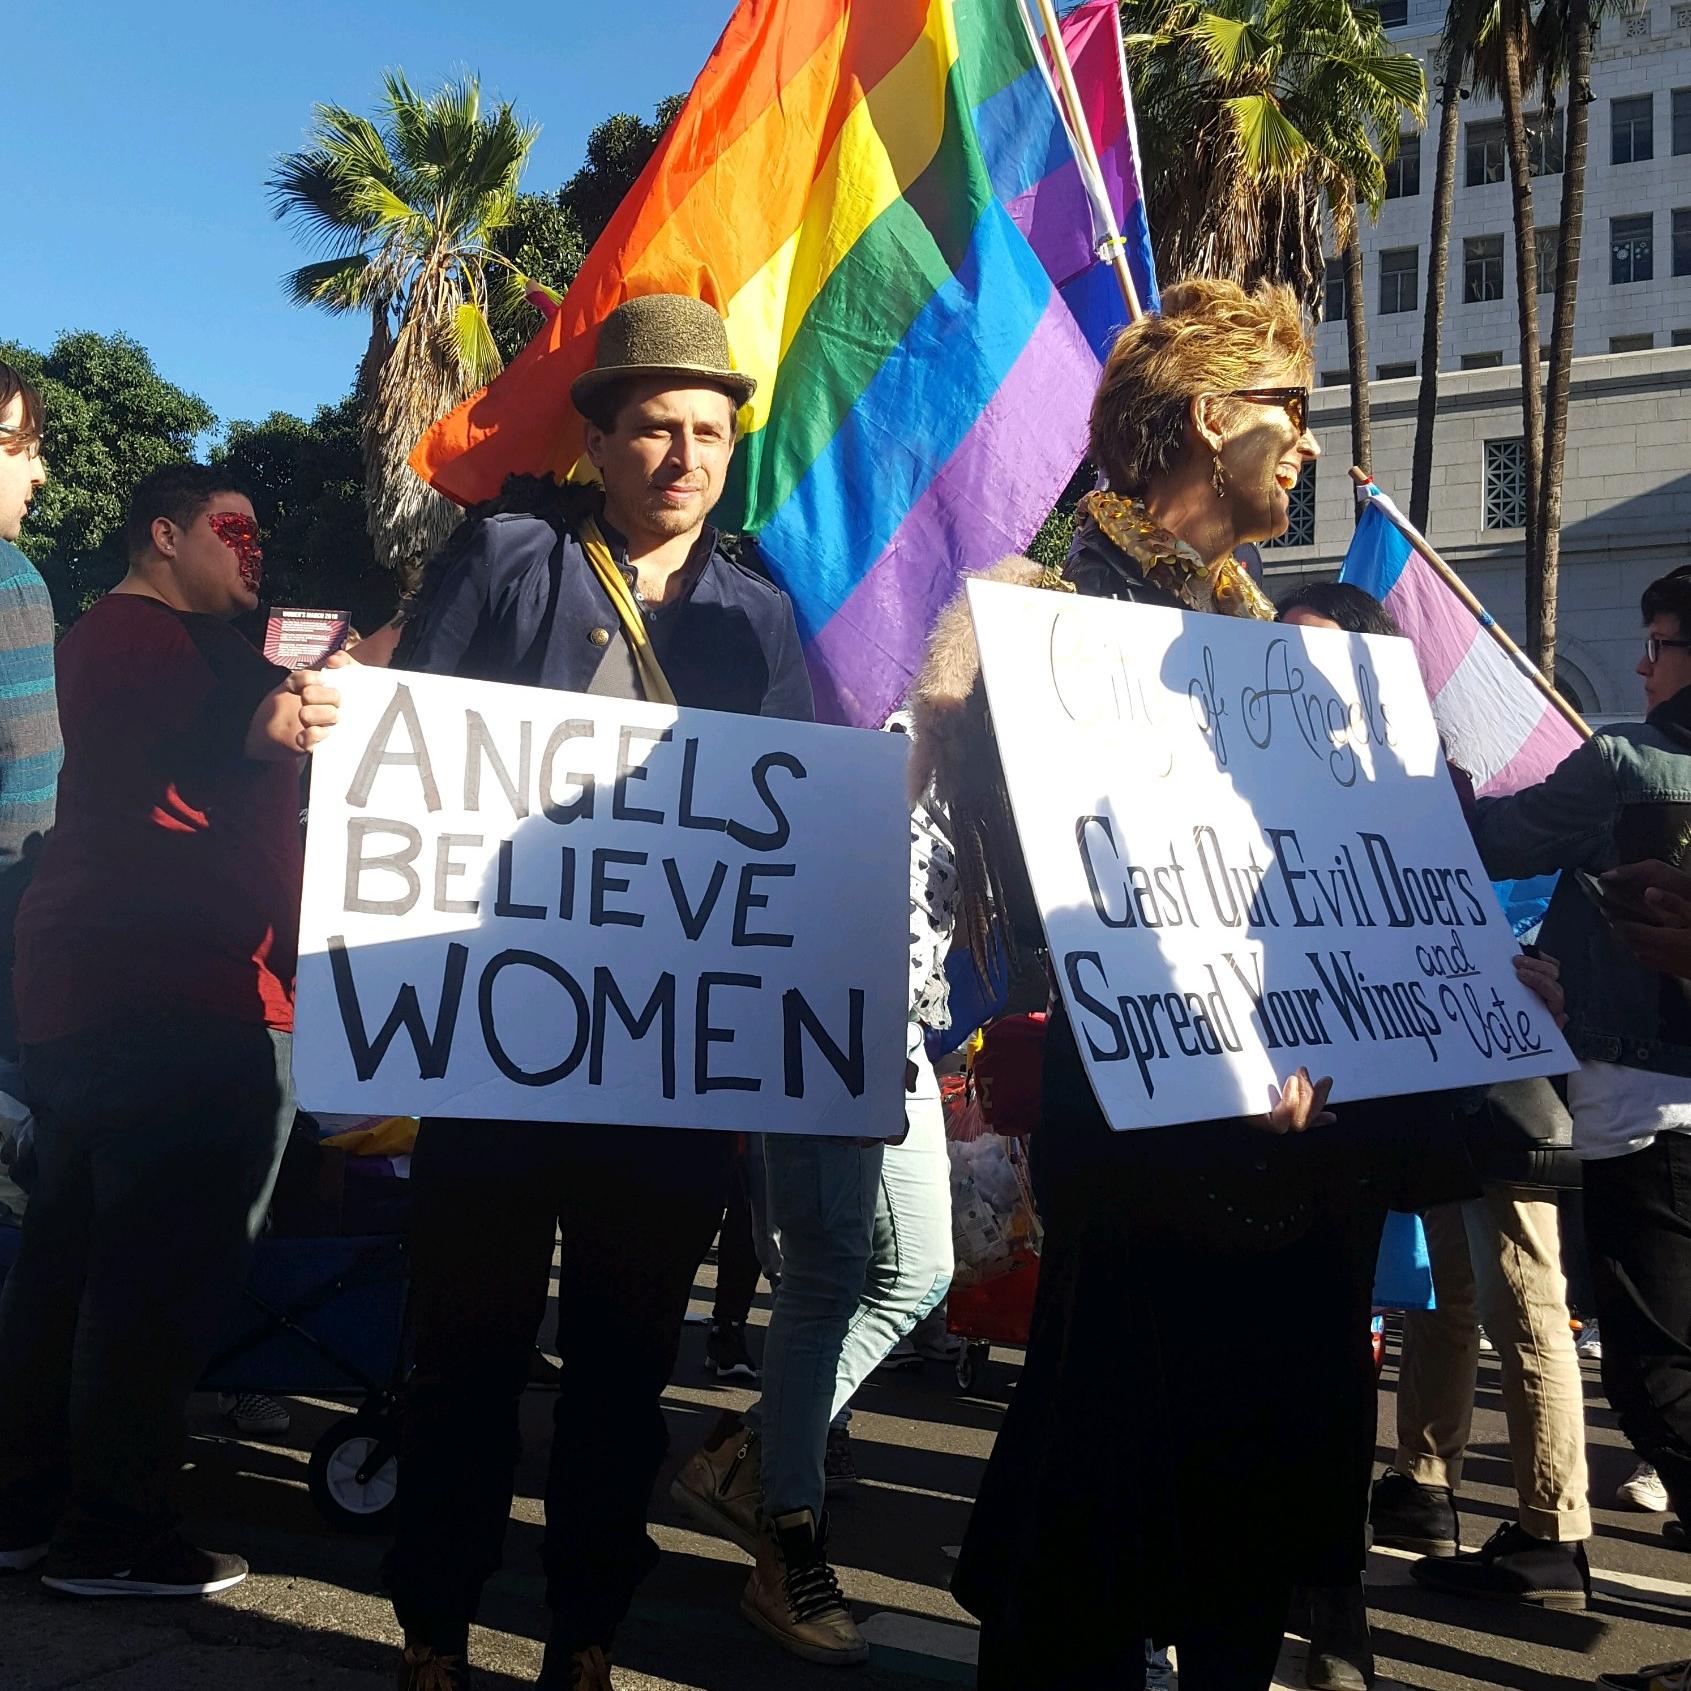 Angel's Believe Women: Max Kleinman - The 2018 Women's March Los Angeles, California